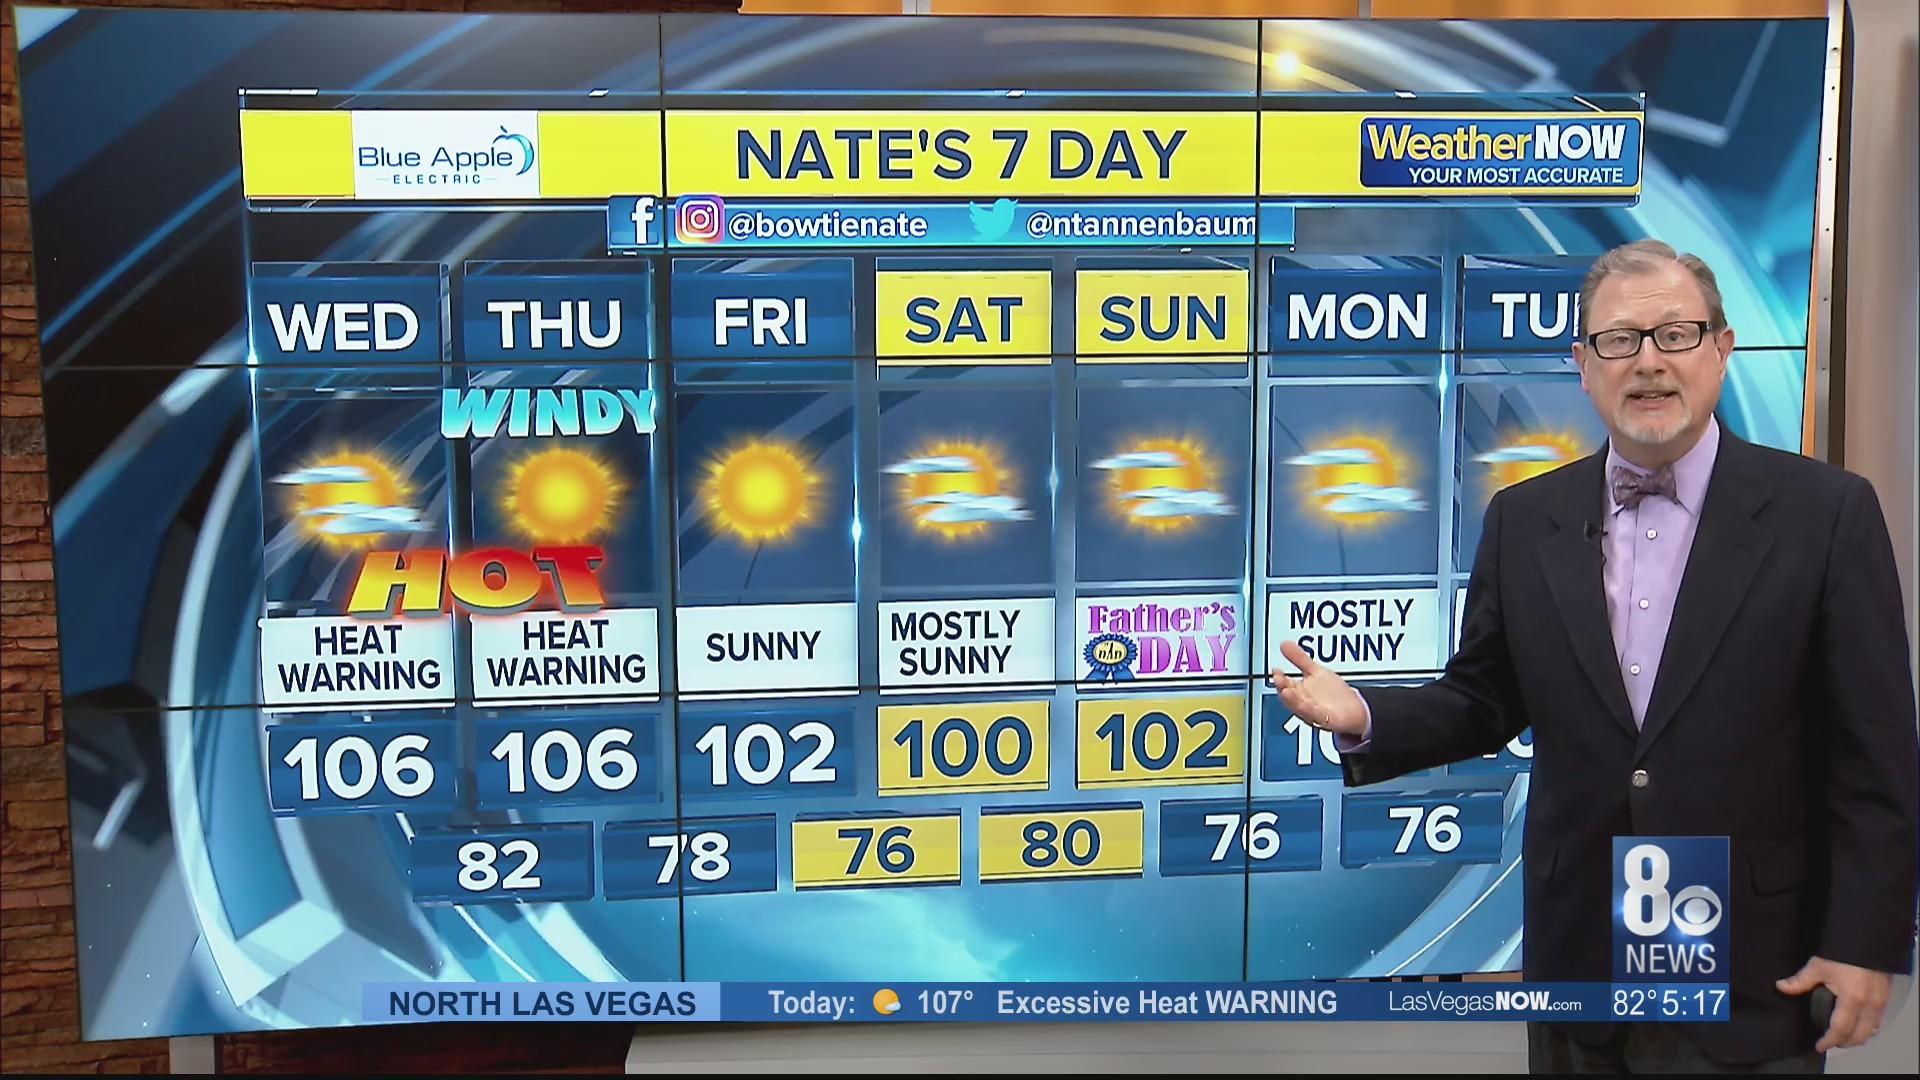 Nate's 7-Day Forecast - Wednesday, june 12, 2019